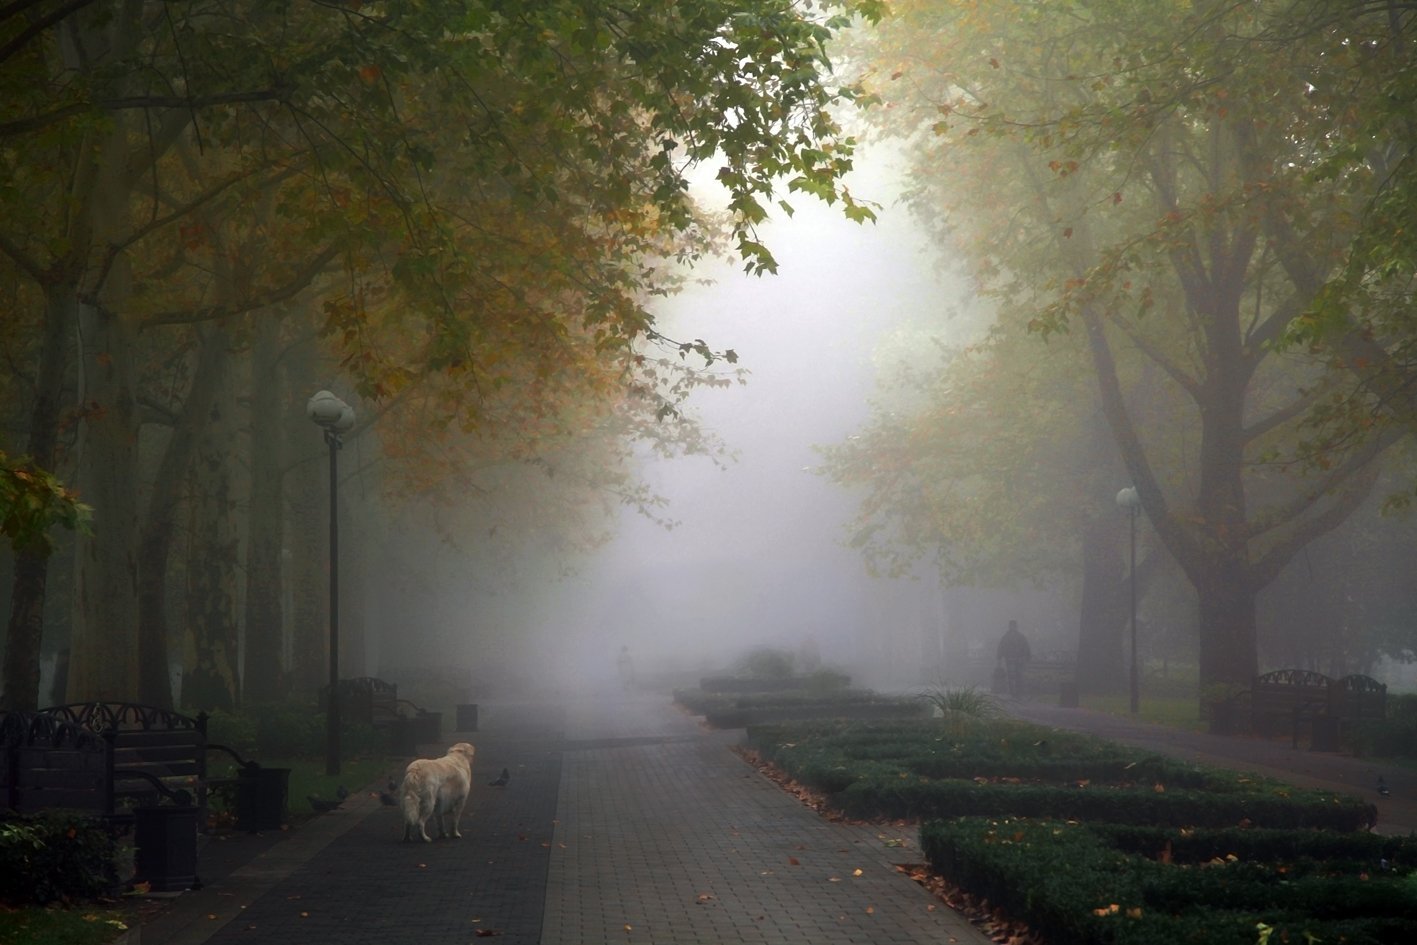 осень, туман, аллея, сквер, собака, Ritta